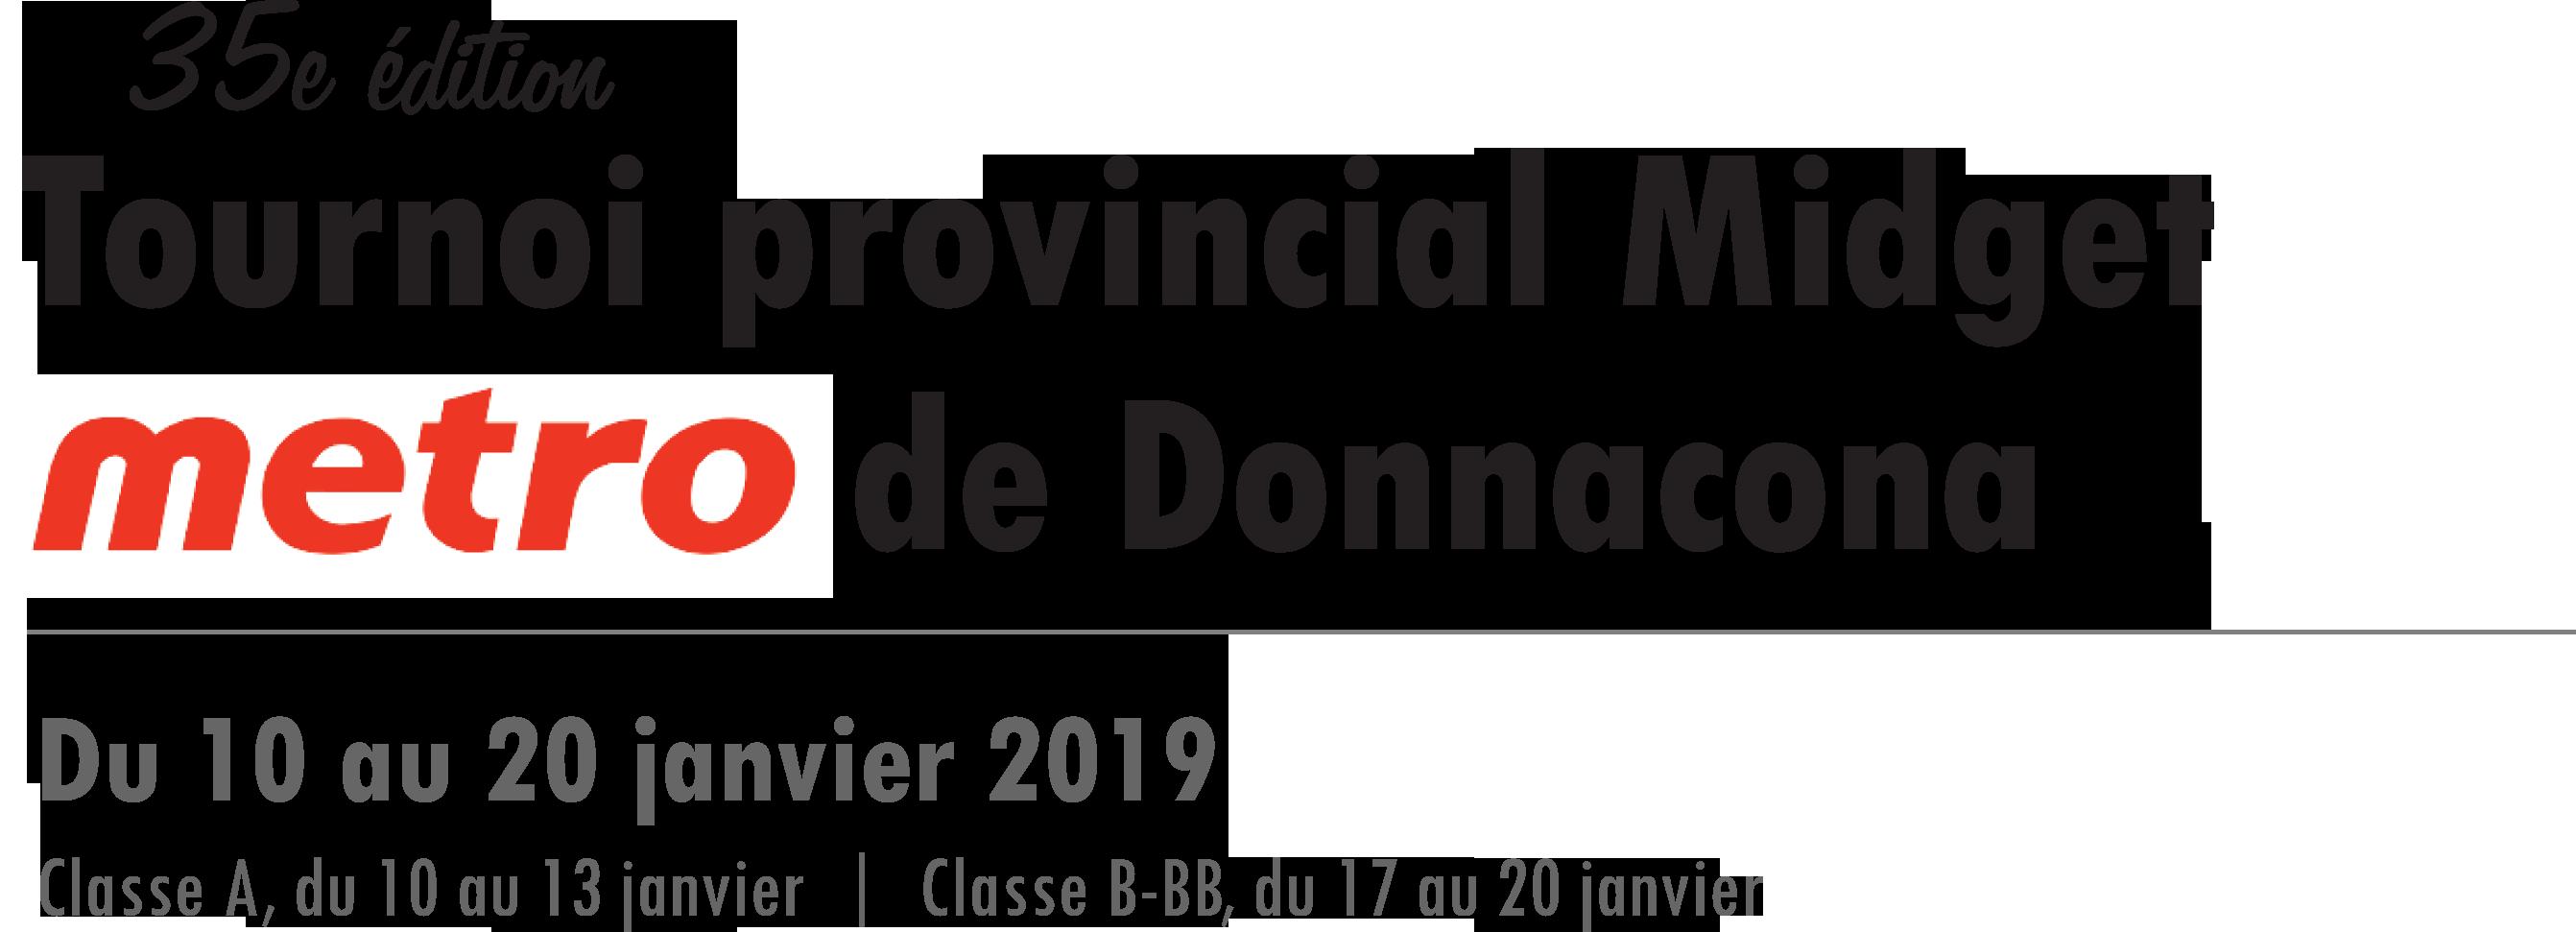 tournament donnacona midget